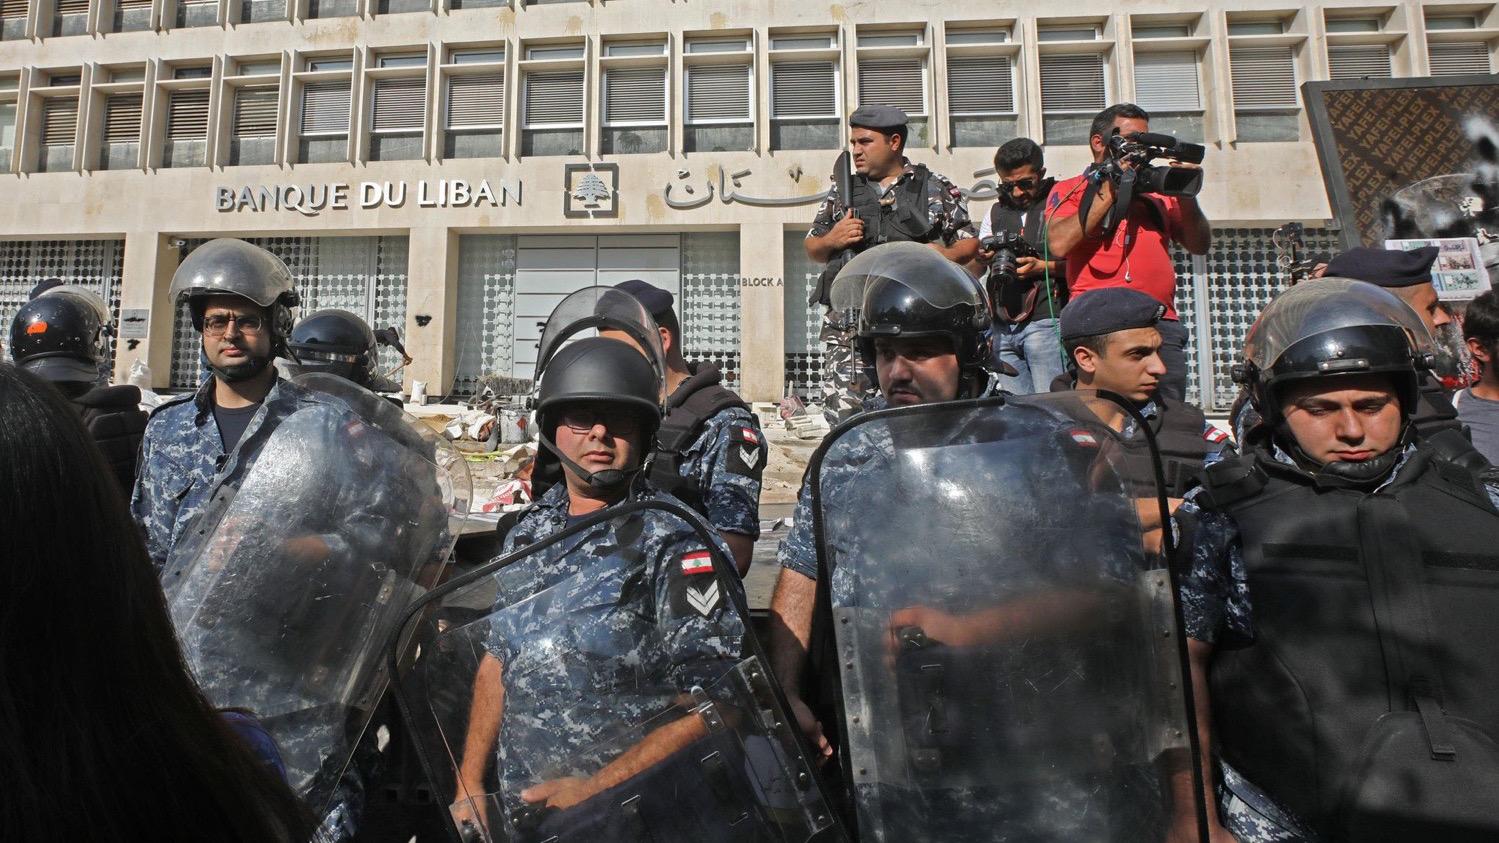 Lebanon's money is on its way to Swiss banks